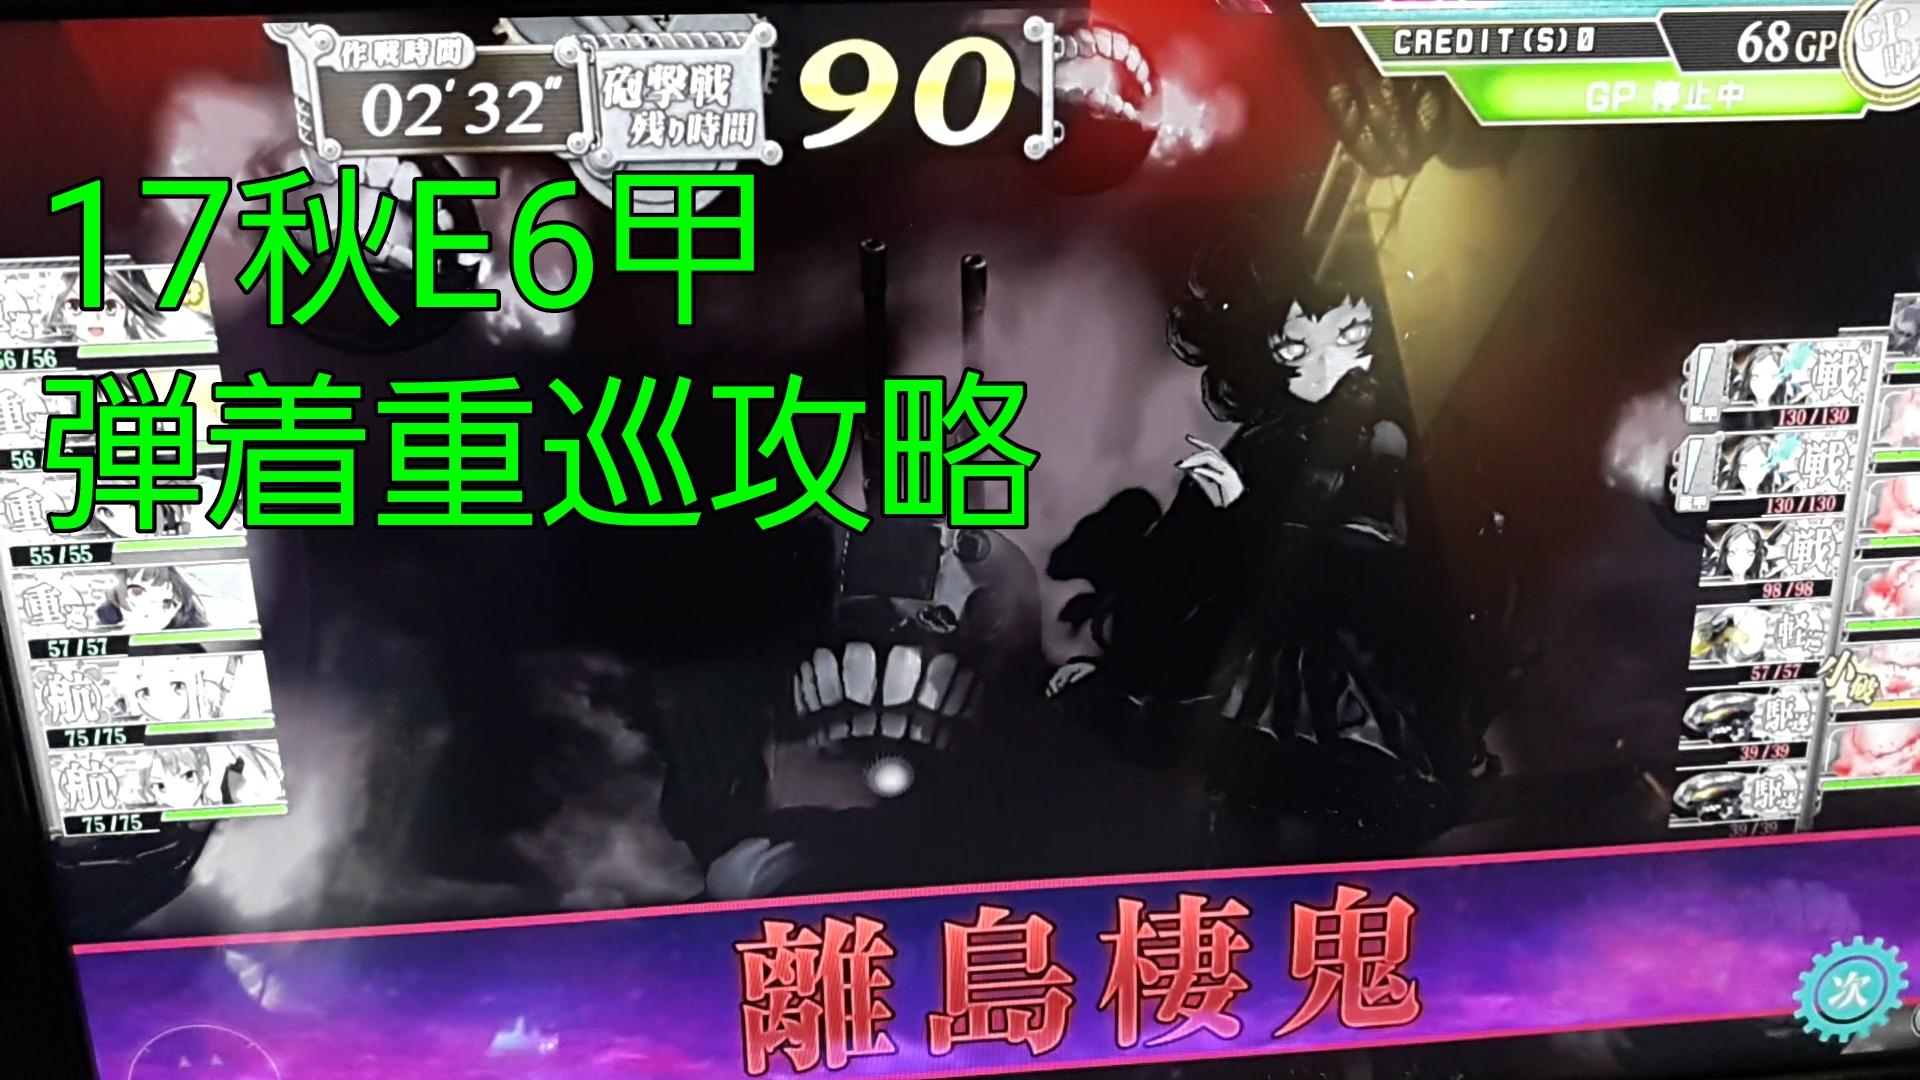 【AC】ピーコック島攻略作戦(17秋E6甲) 重巡4空母2 プレイ動画